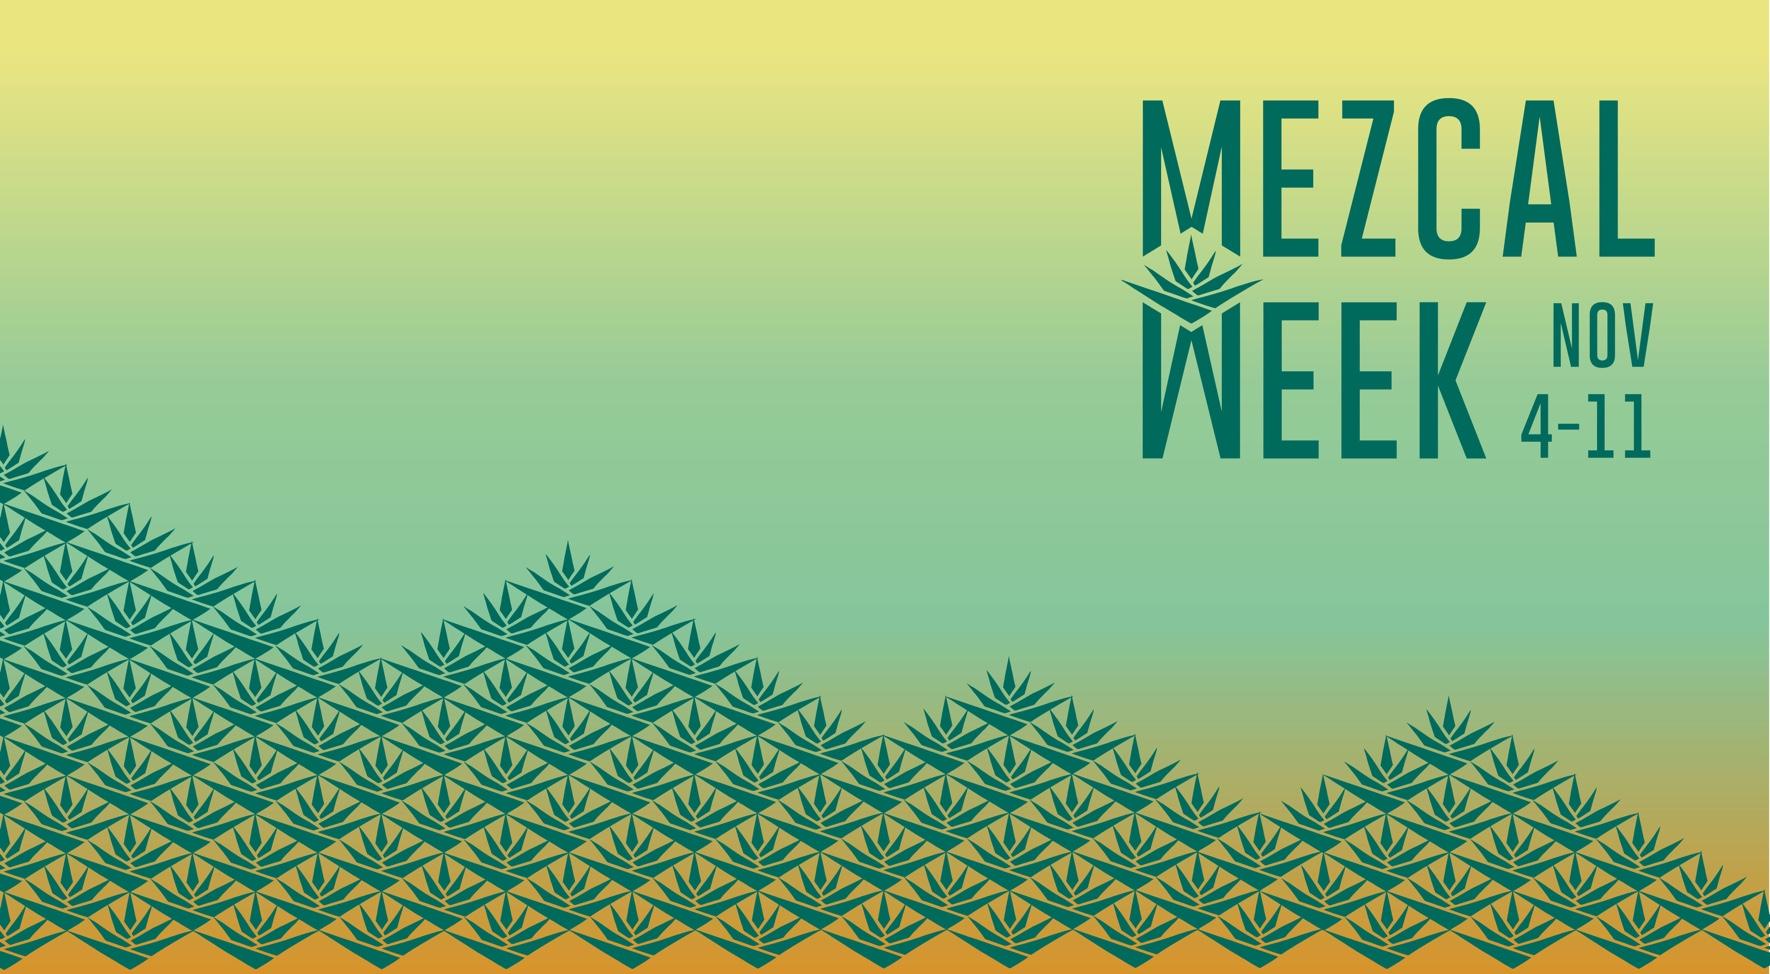 mezcal week